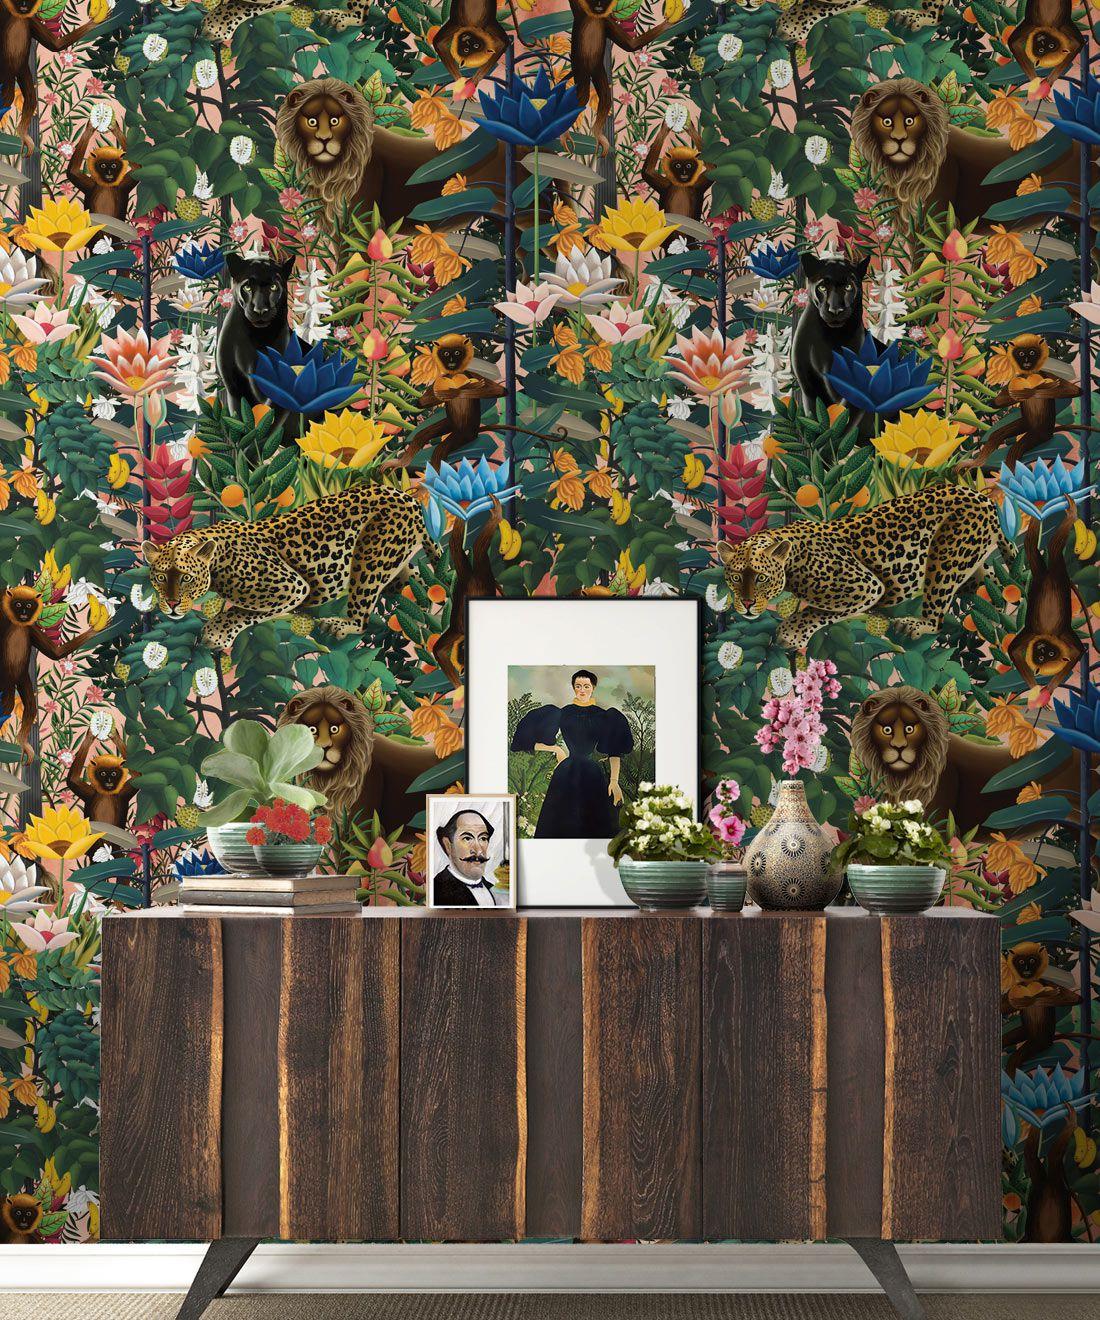 The Jungle Wallpaper • Animal Wallpaper • Botanical Wallpaper • Coral Wallpaper • Insitu